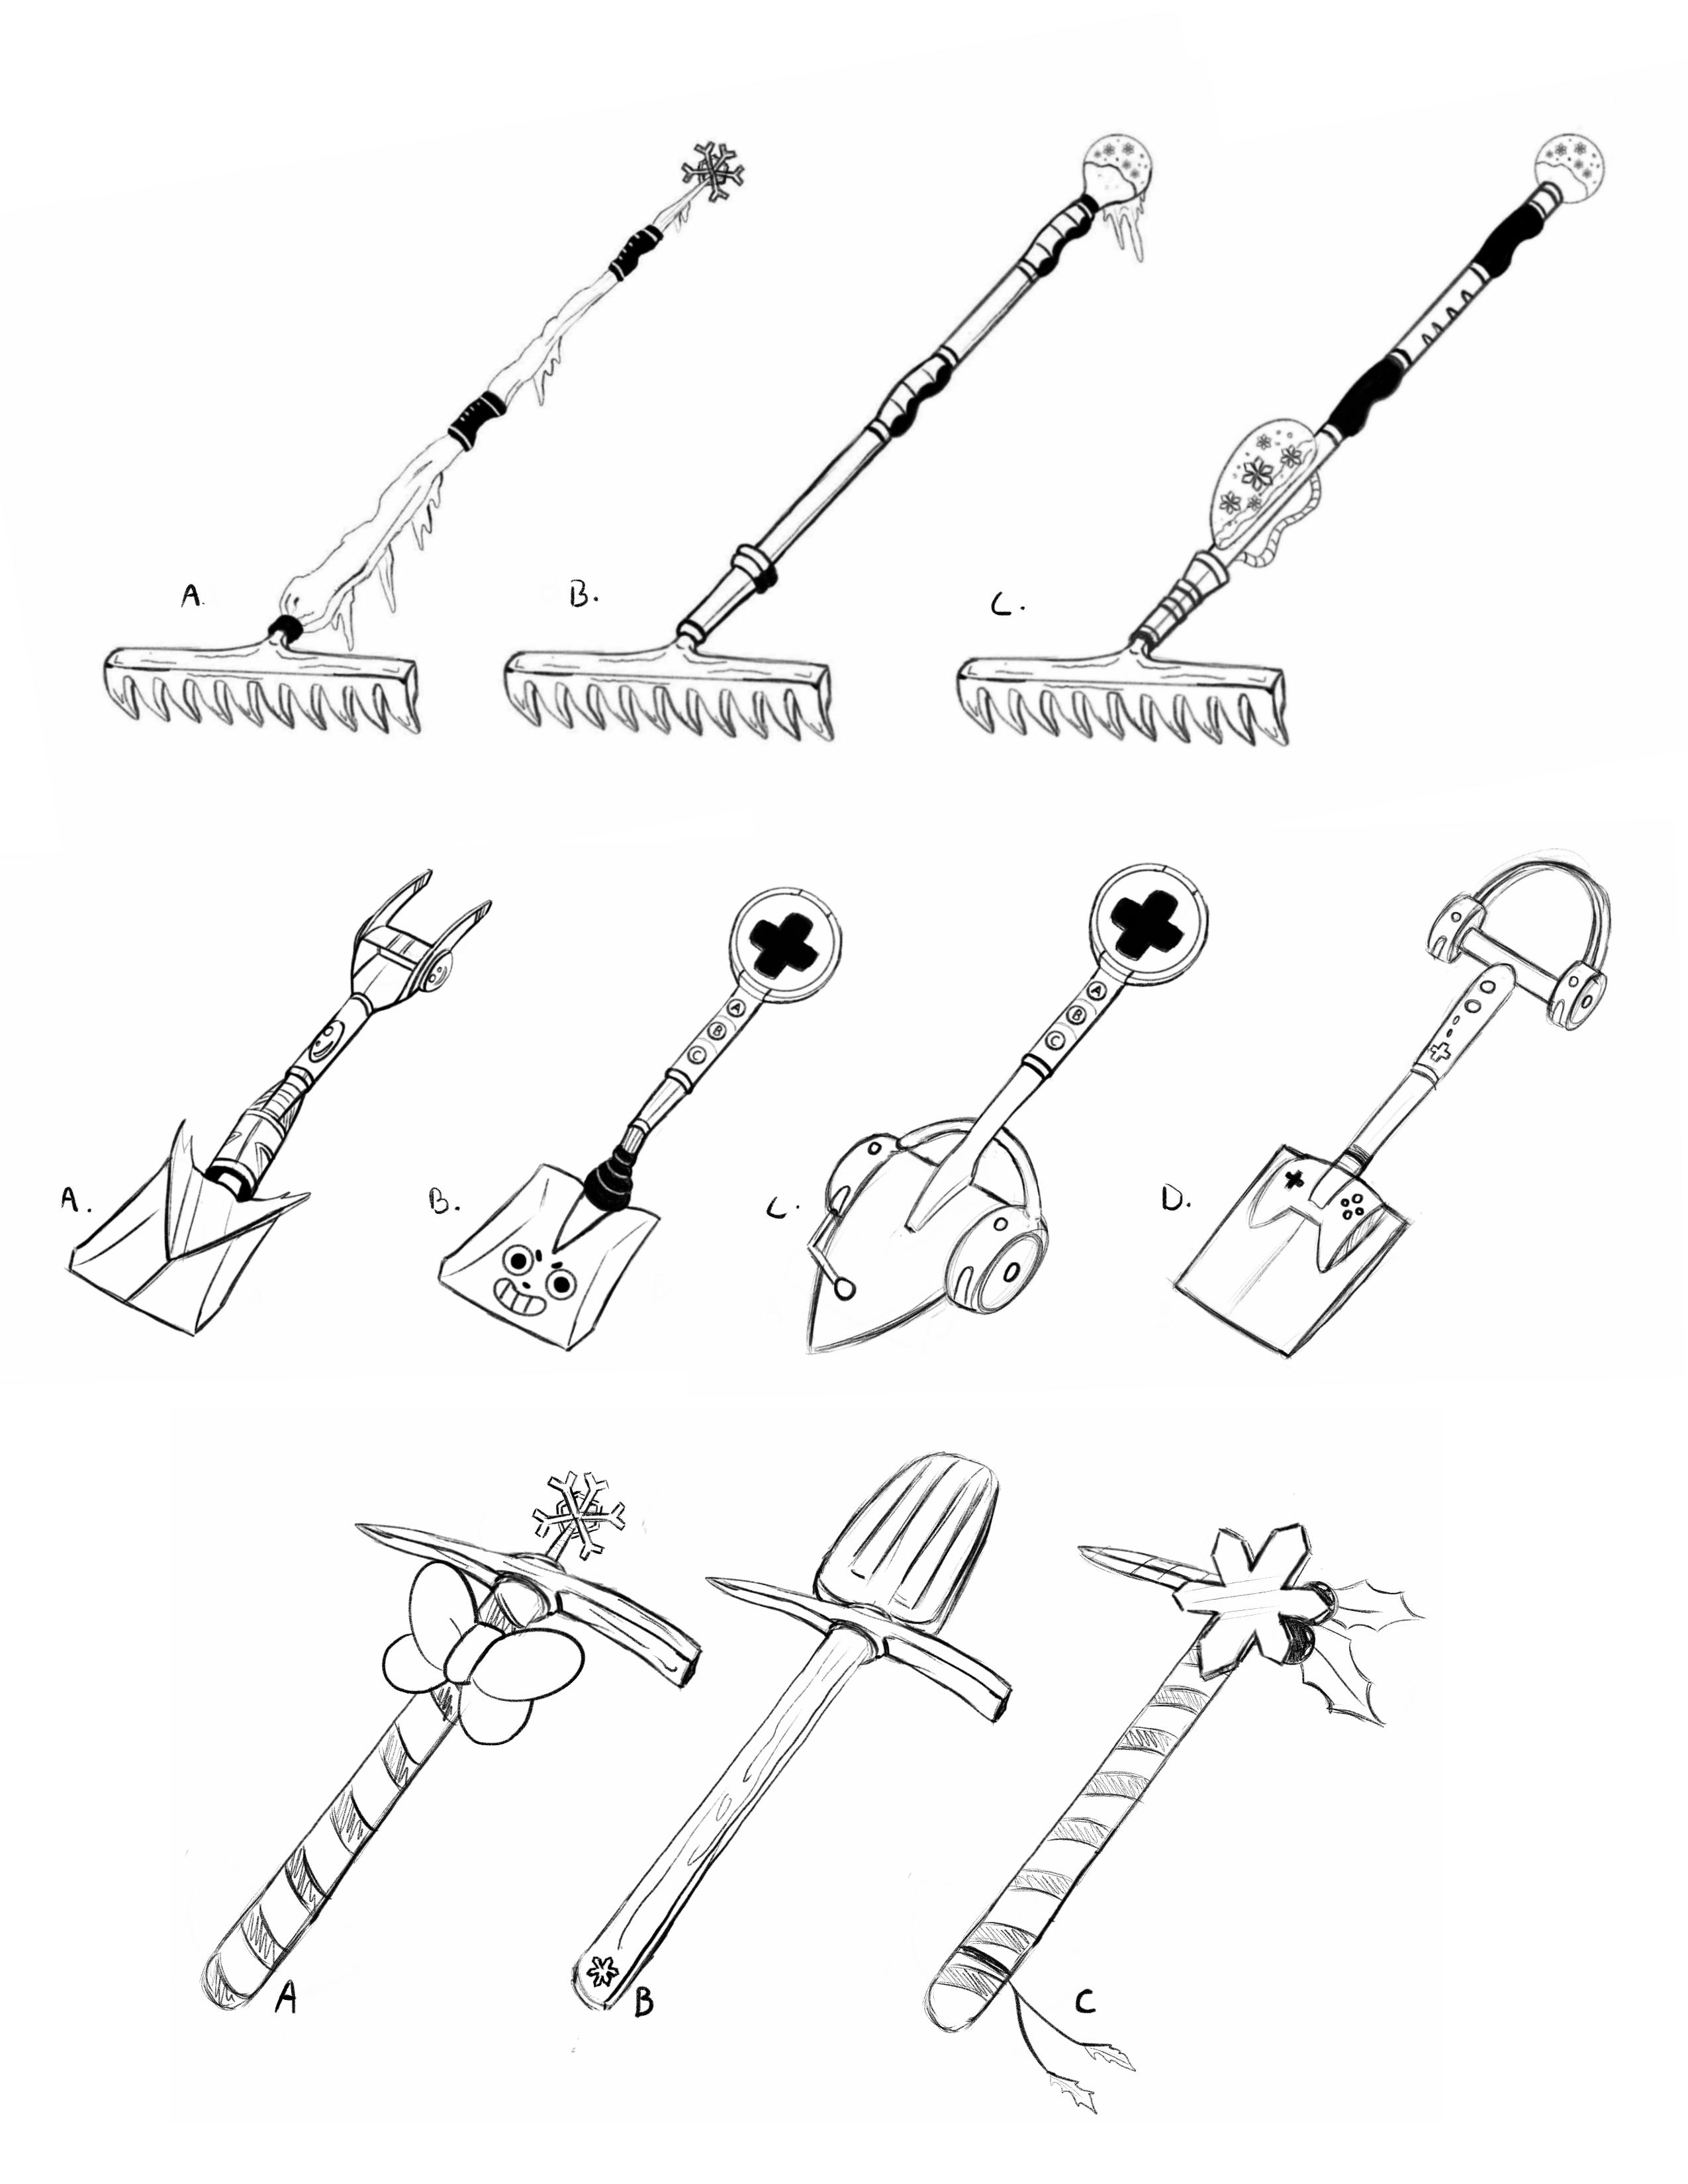 Rake, shovel and pick axe weapon props